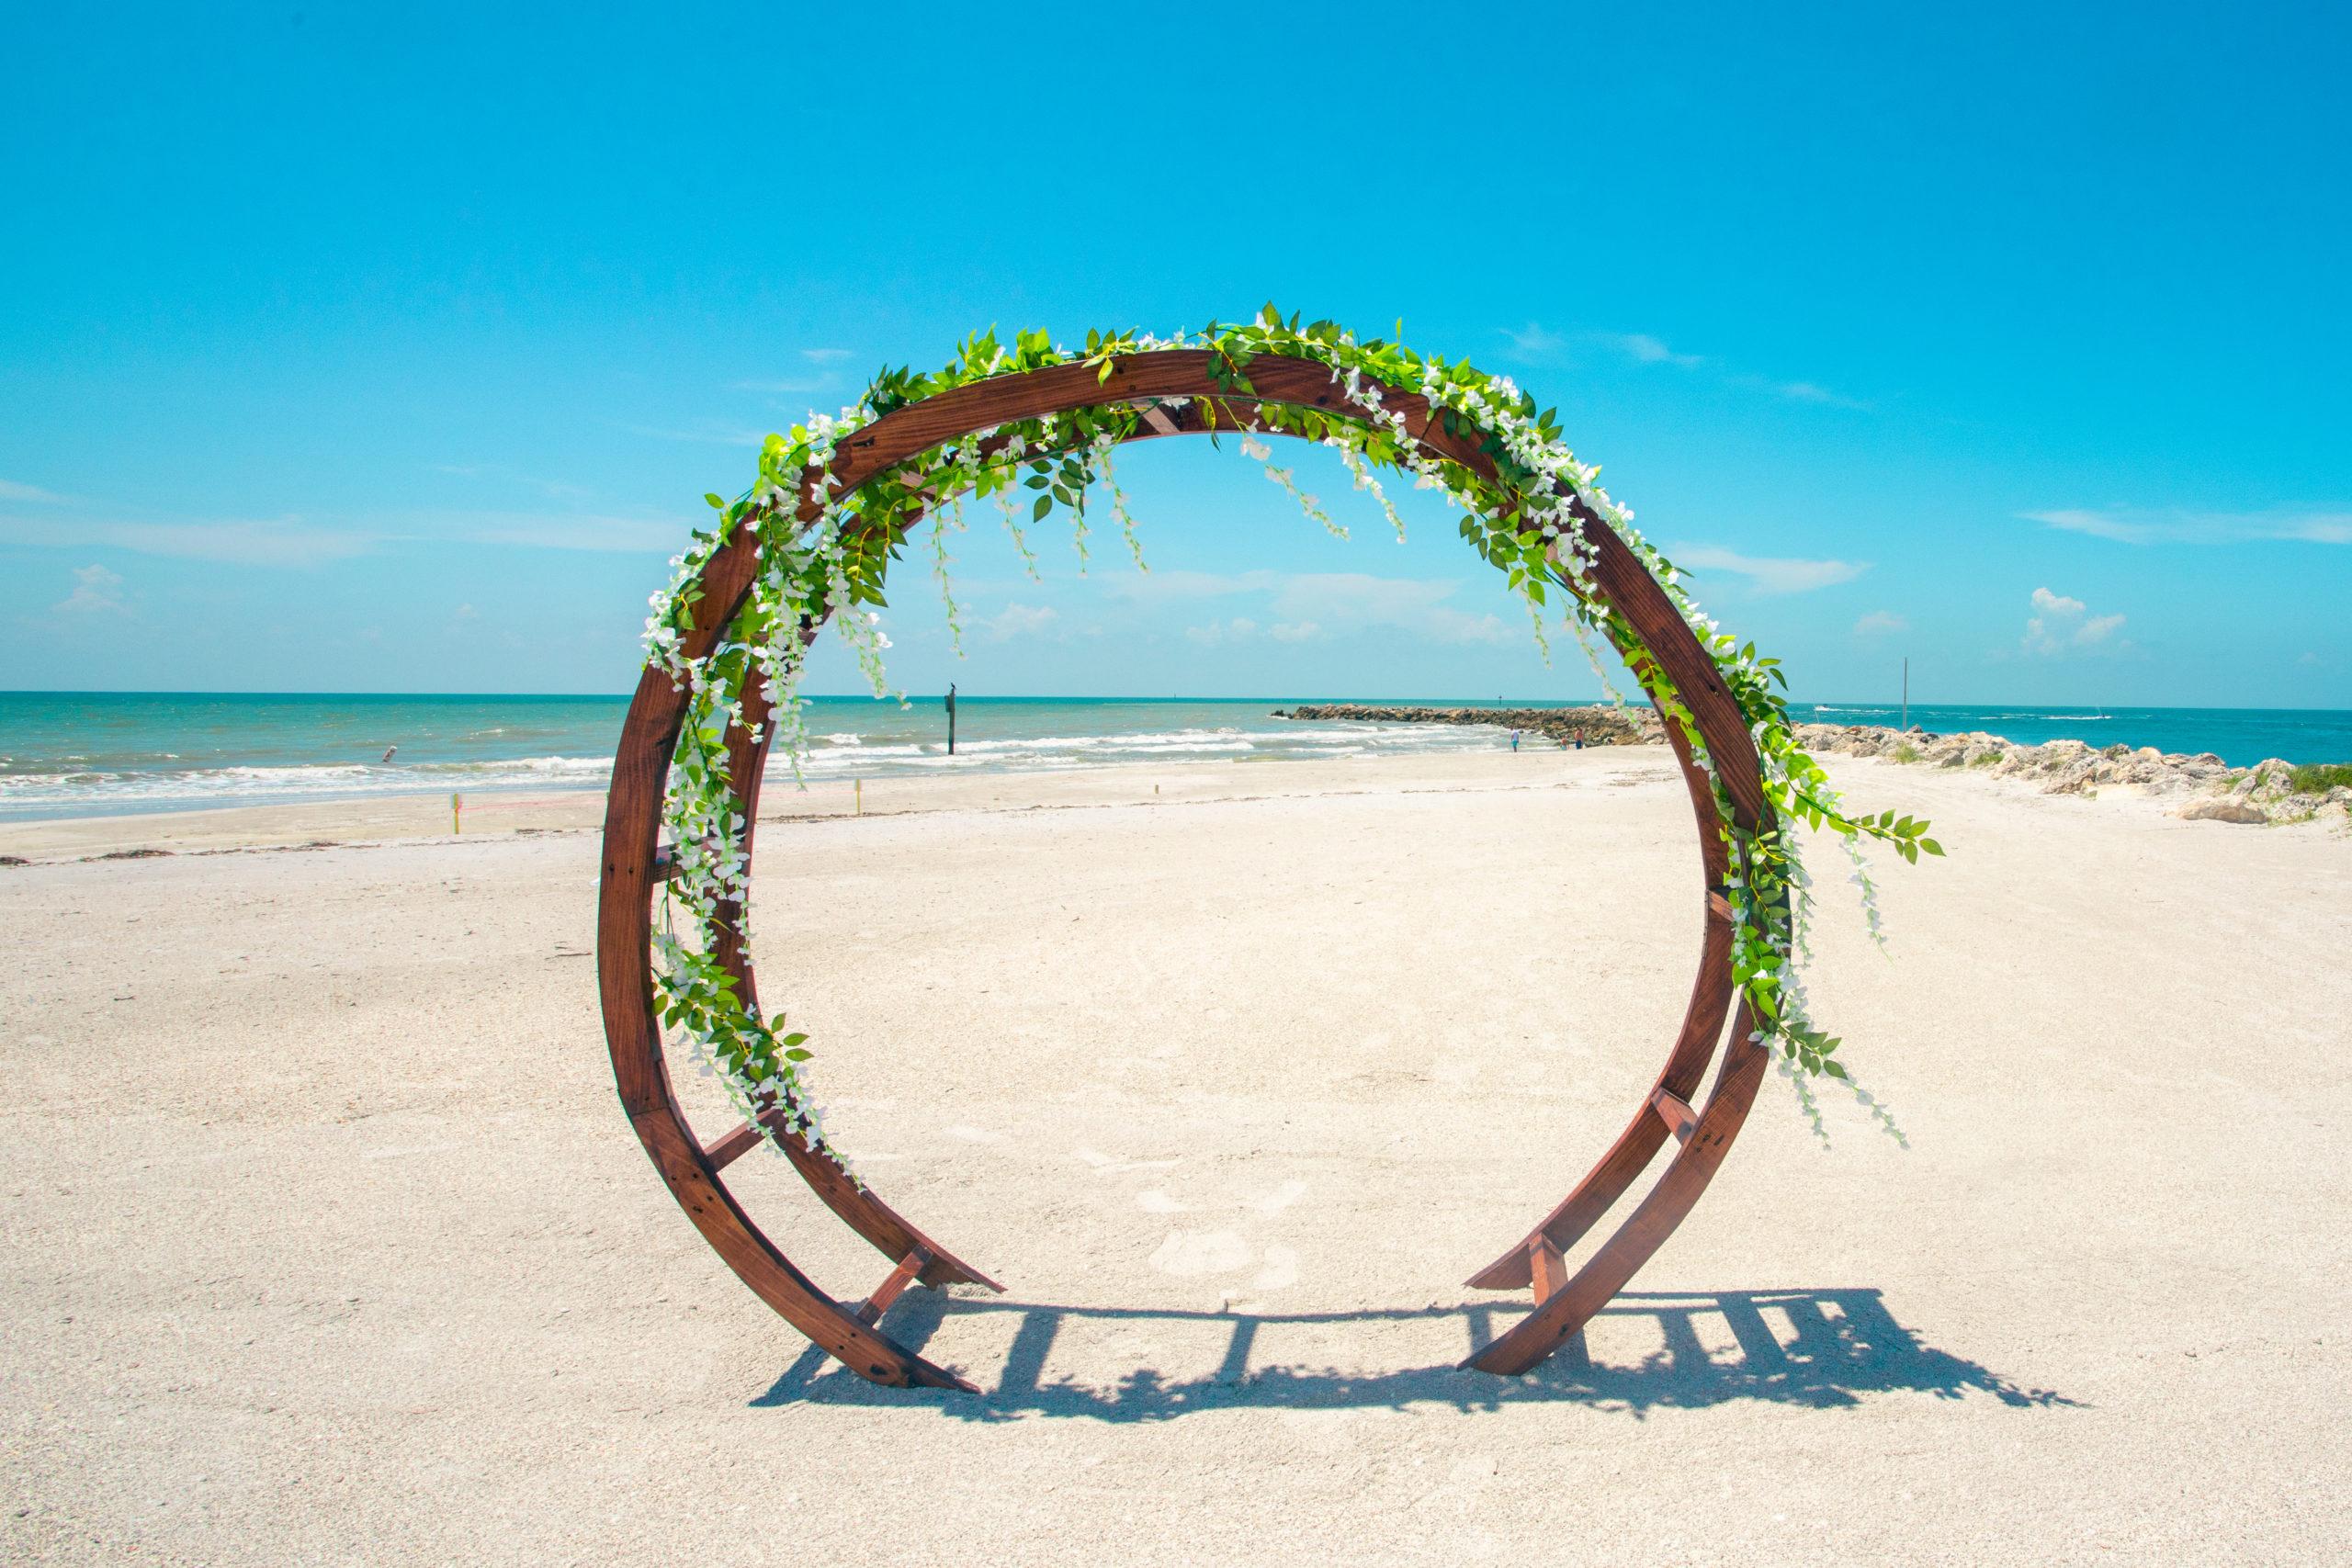 Circular arch on the beach